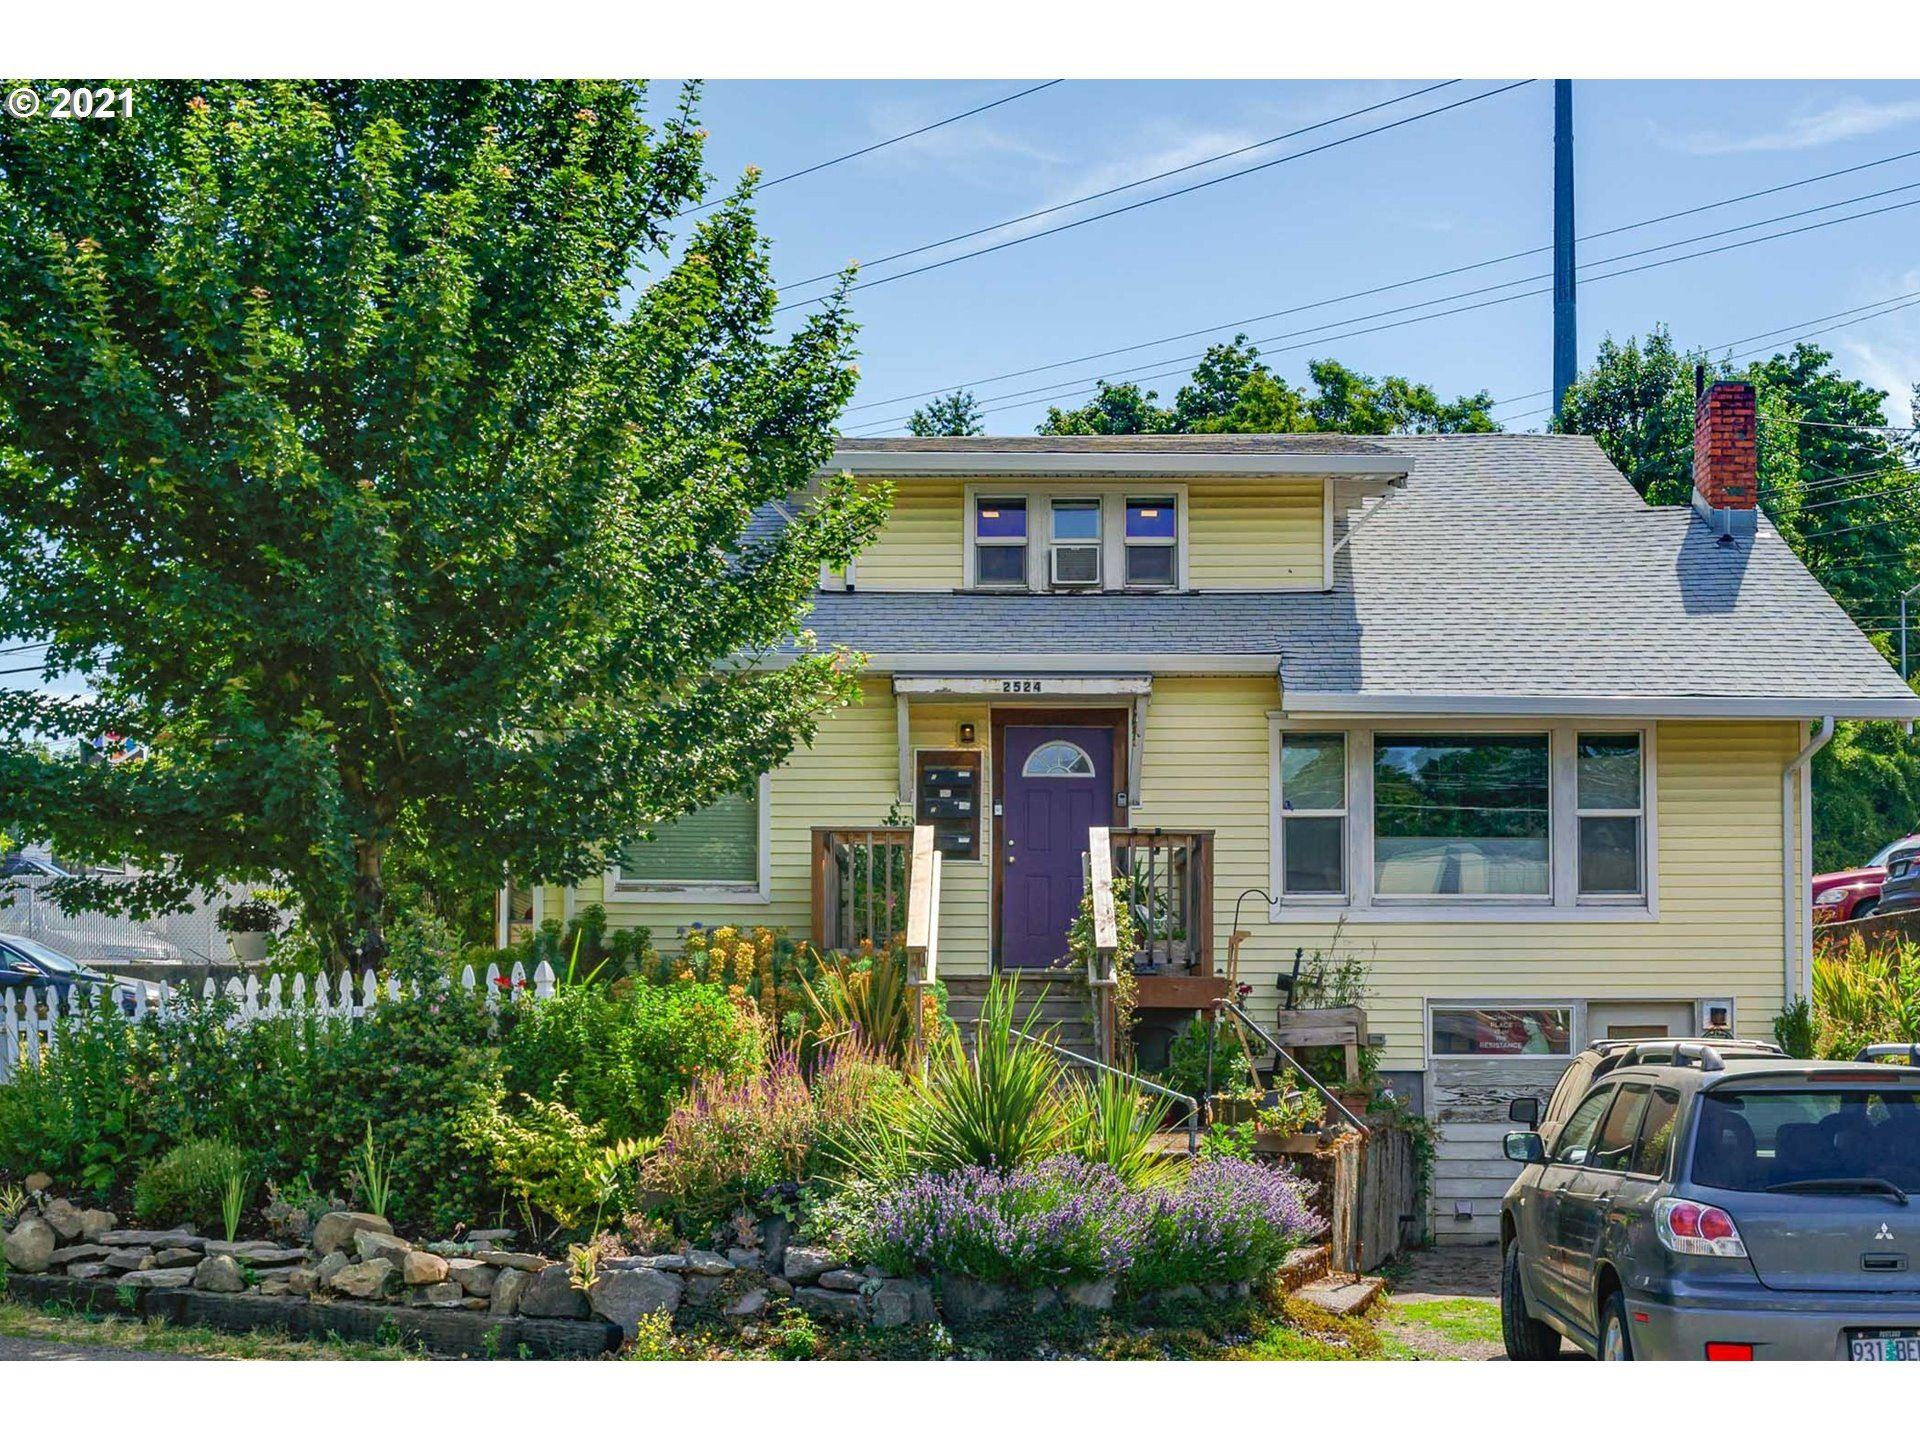 2524 SW SPRING GARDEN ST, Portland, OR 97219 - MLS#: 21566959